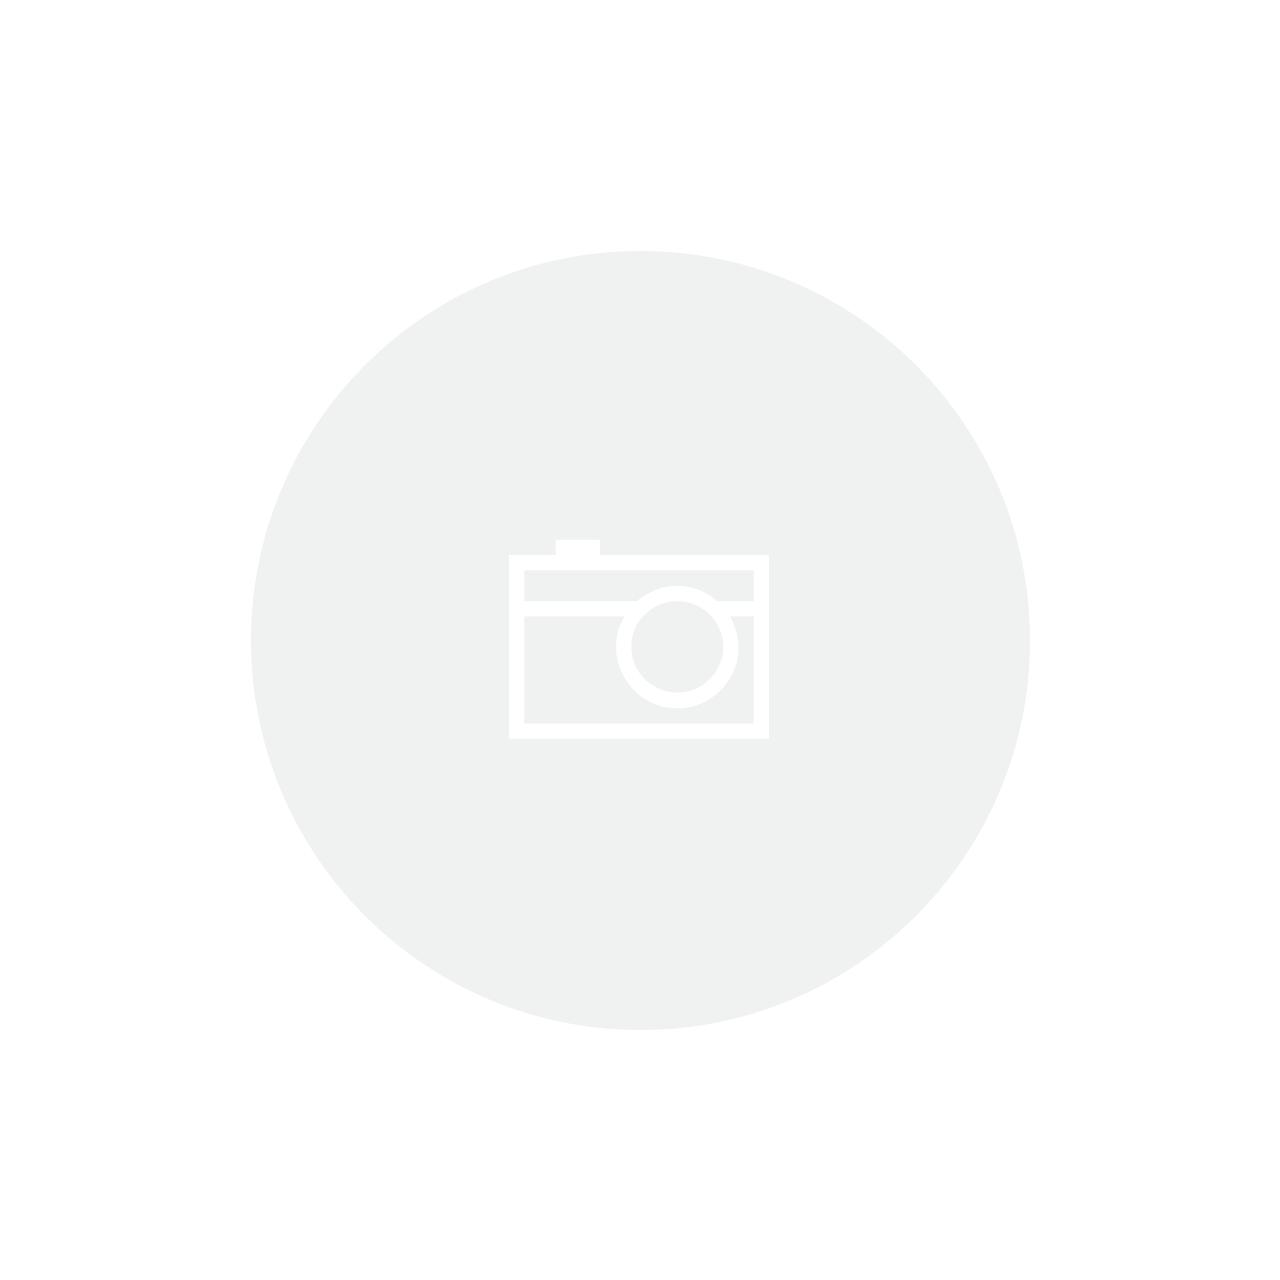 FONTE THERMALTAKE SMART ATX 80PLUS WHITE 600W - SPD-0600P